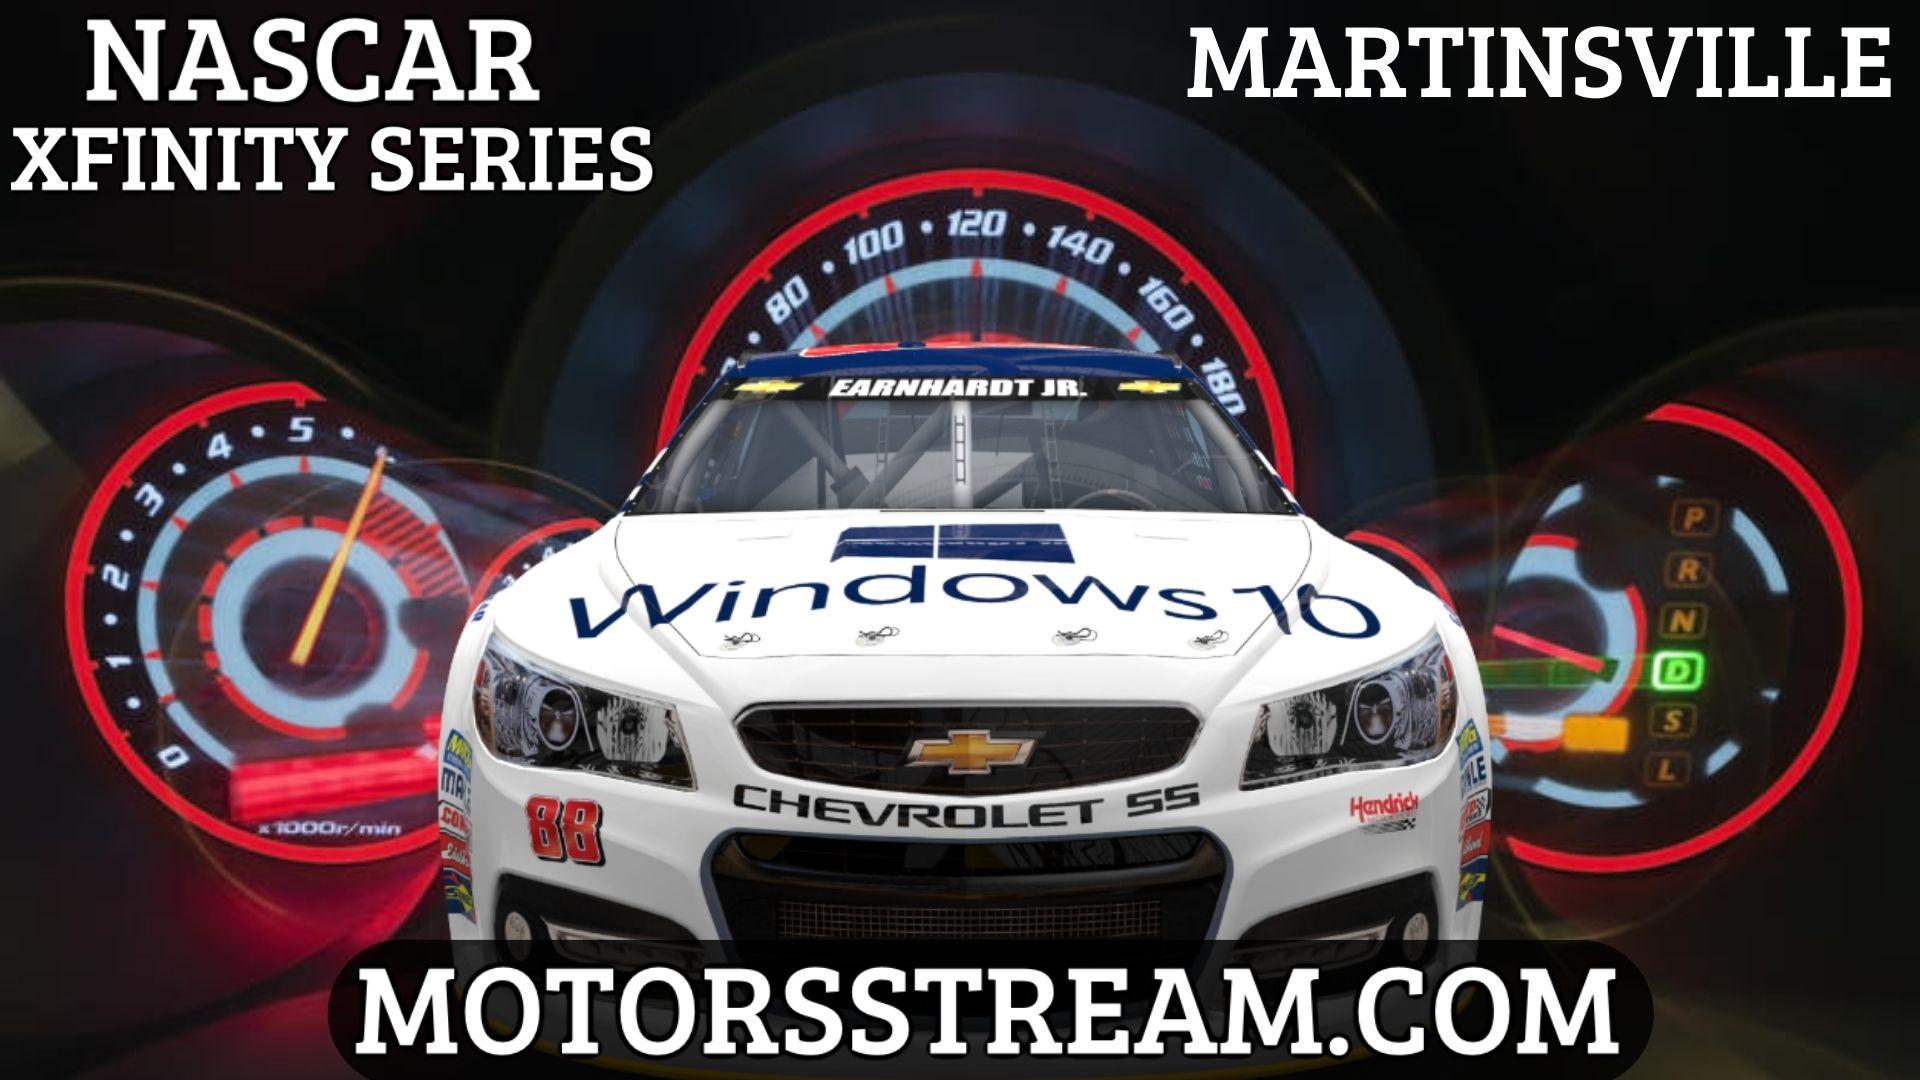 NASCAR Xfinity Series Playoff Race At Martinsville Live Stream | Martinsville 2021